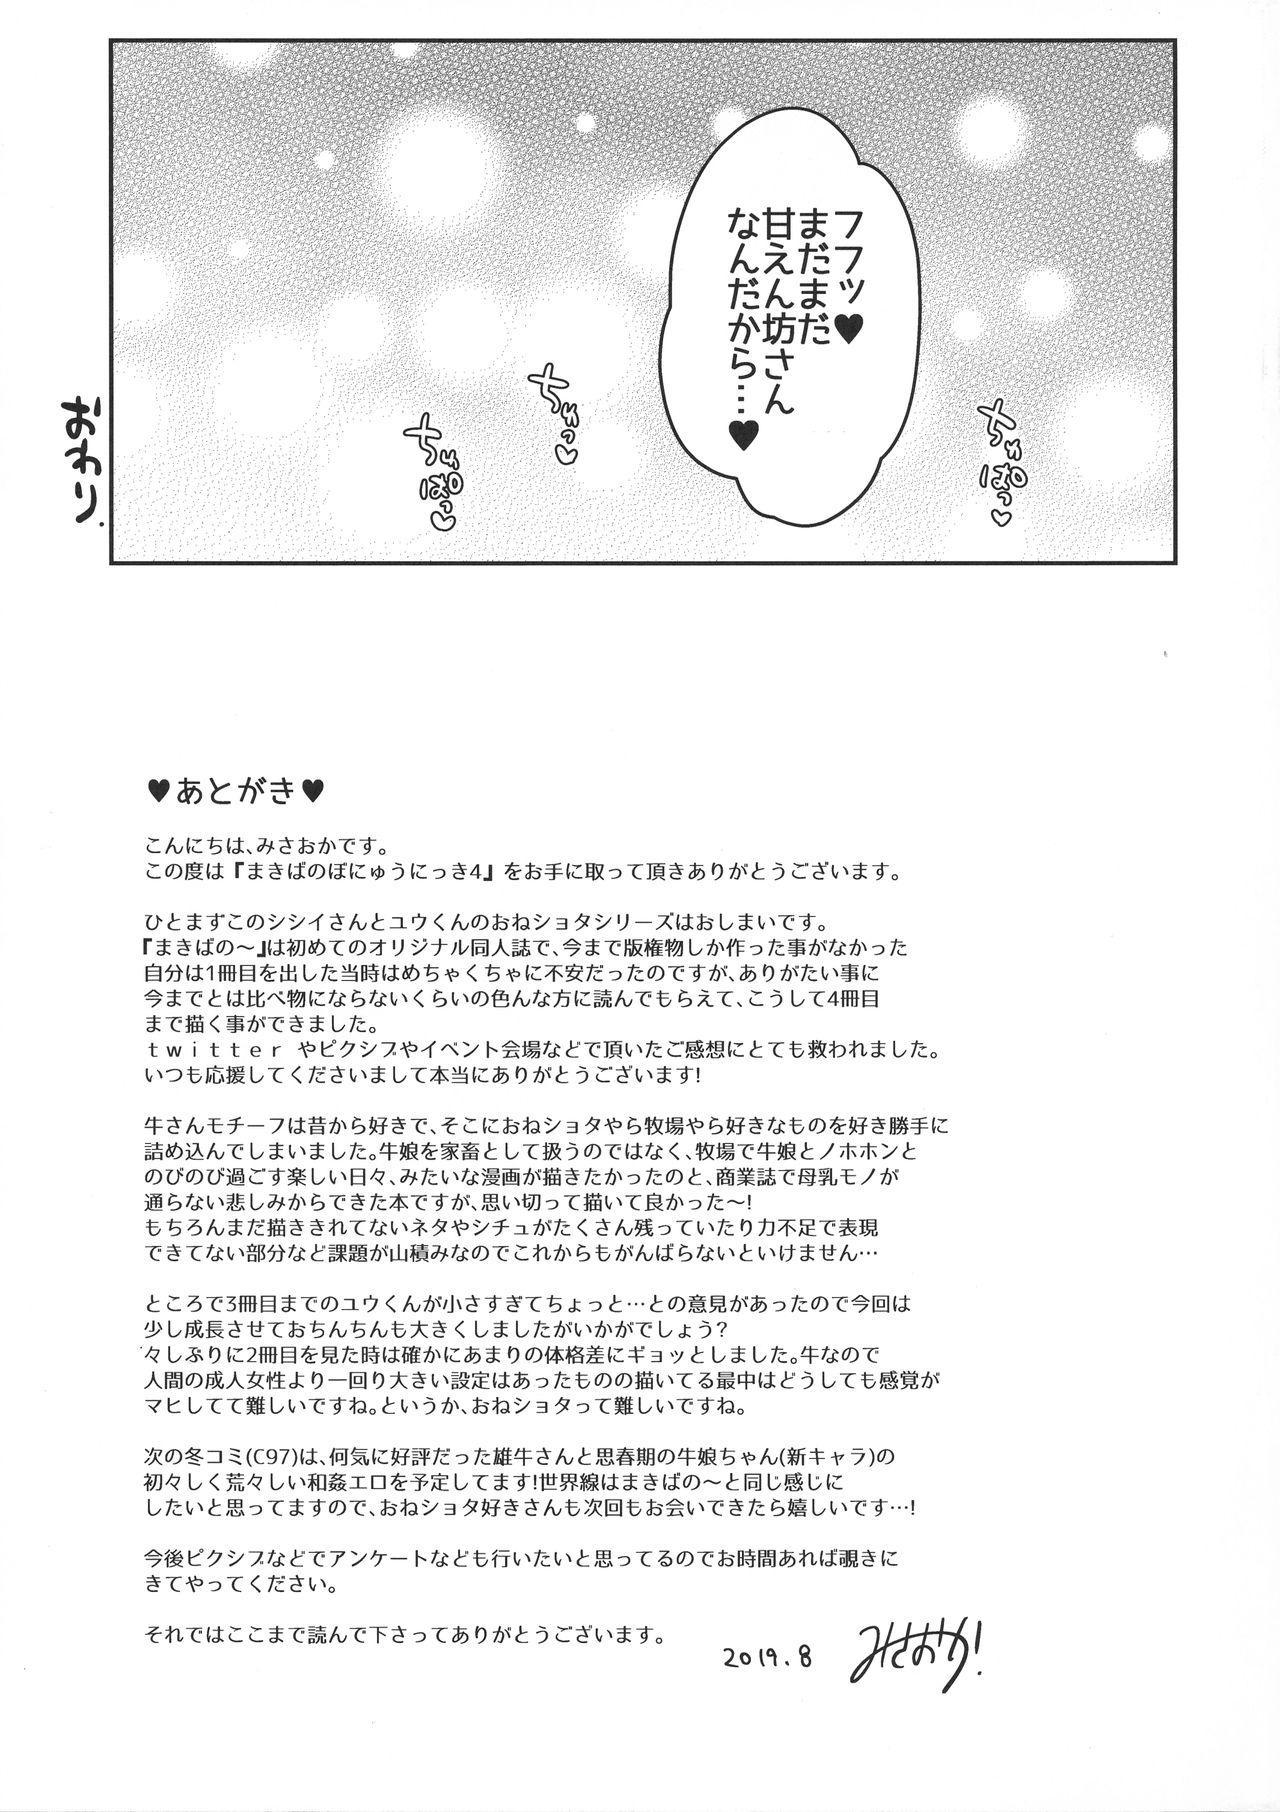 Makiba no Bonyuu Nikki 4 24